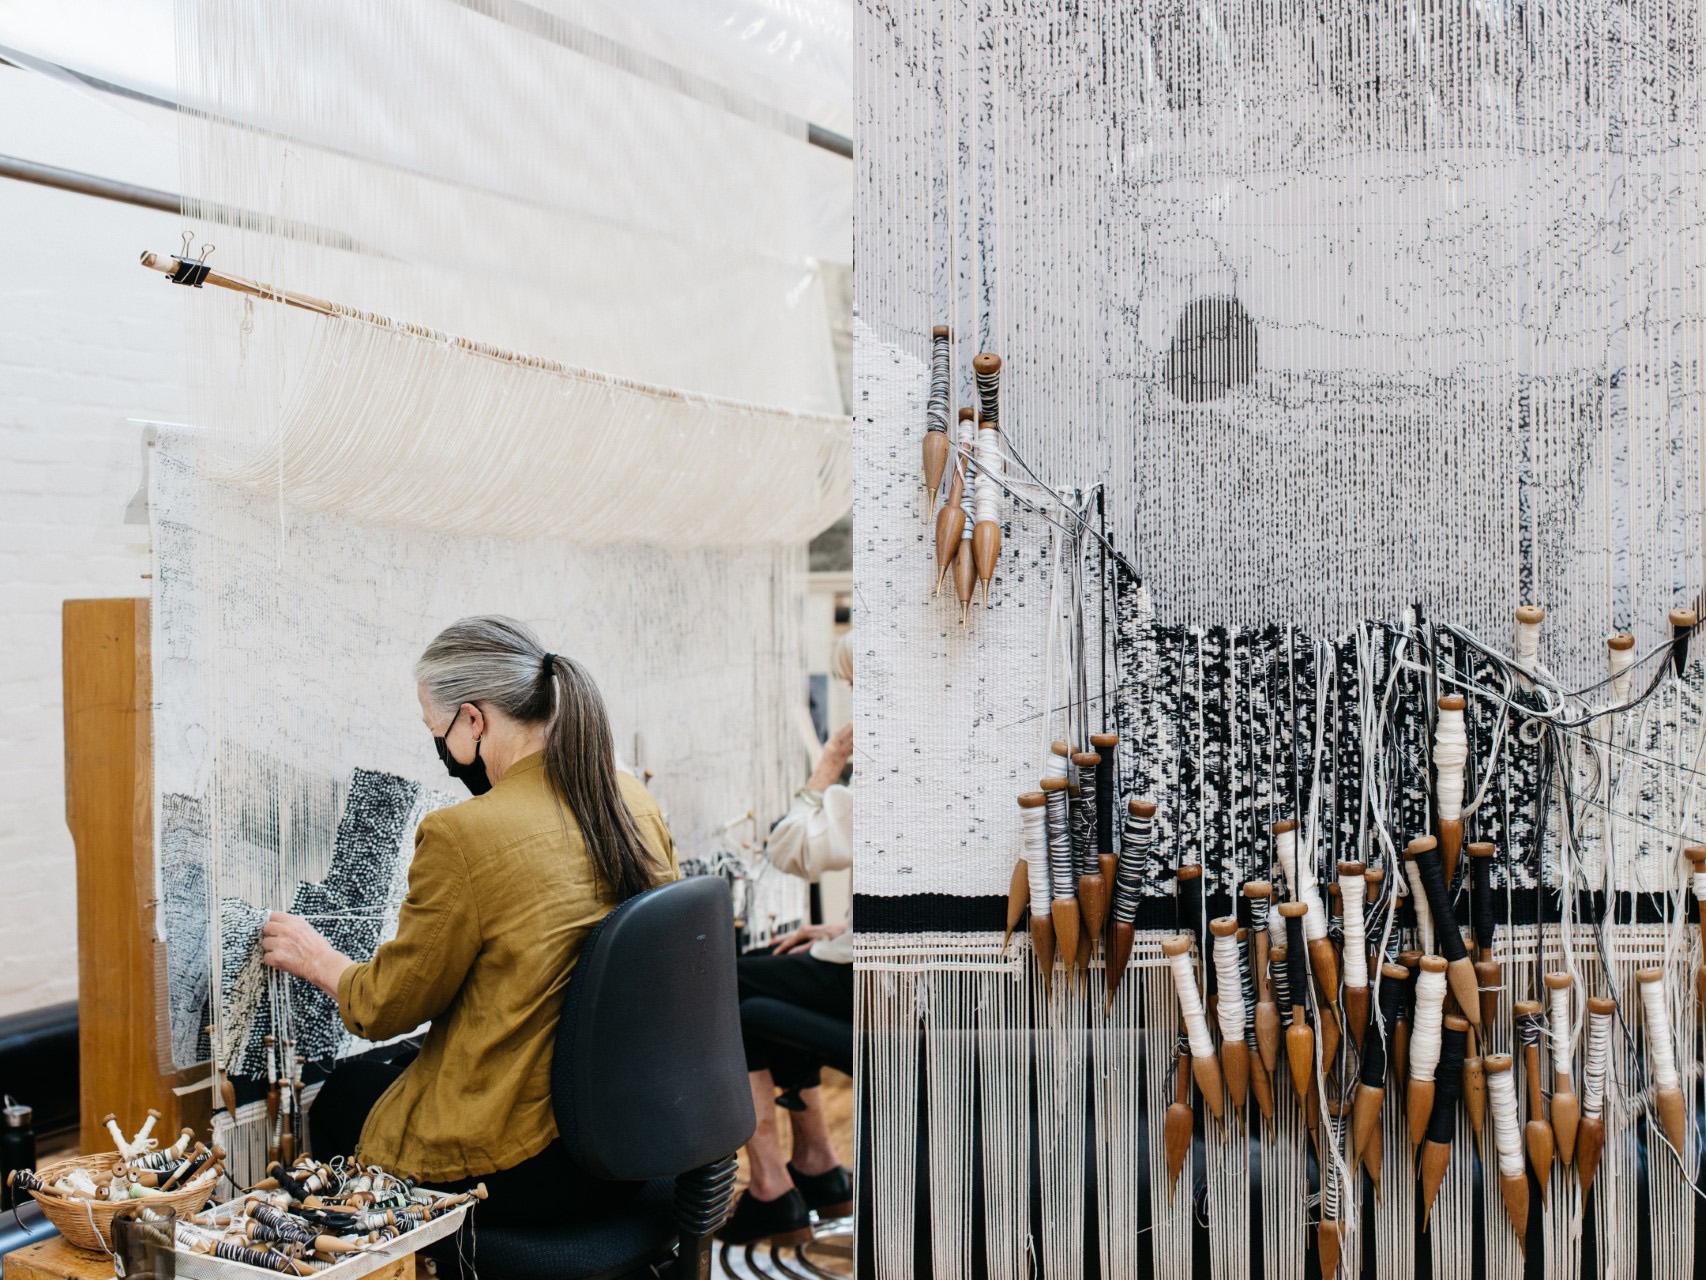 Left to right: ATW weaver Pamela Joyce working on 'Ilpili', designed by Kunmanara Carroll in 2021; Close up view of 'Ilpili', 2021, Pepai Jangala Carroll, woven by Pamela Joyce, Chris Cochius, Cheryl Thornton & Sue Batten. Photos: Marie-Luise Skibbe.